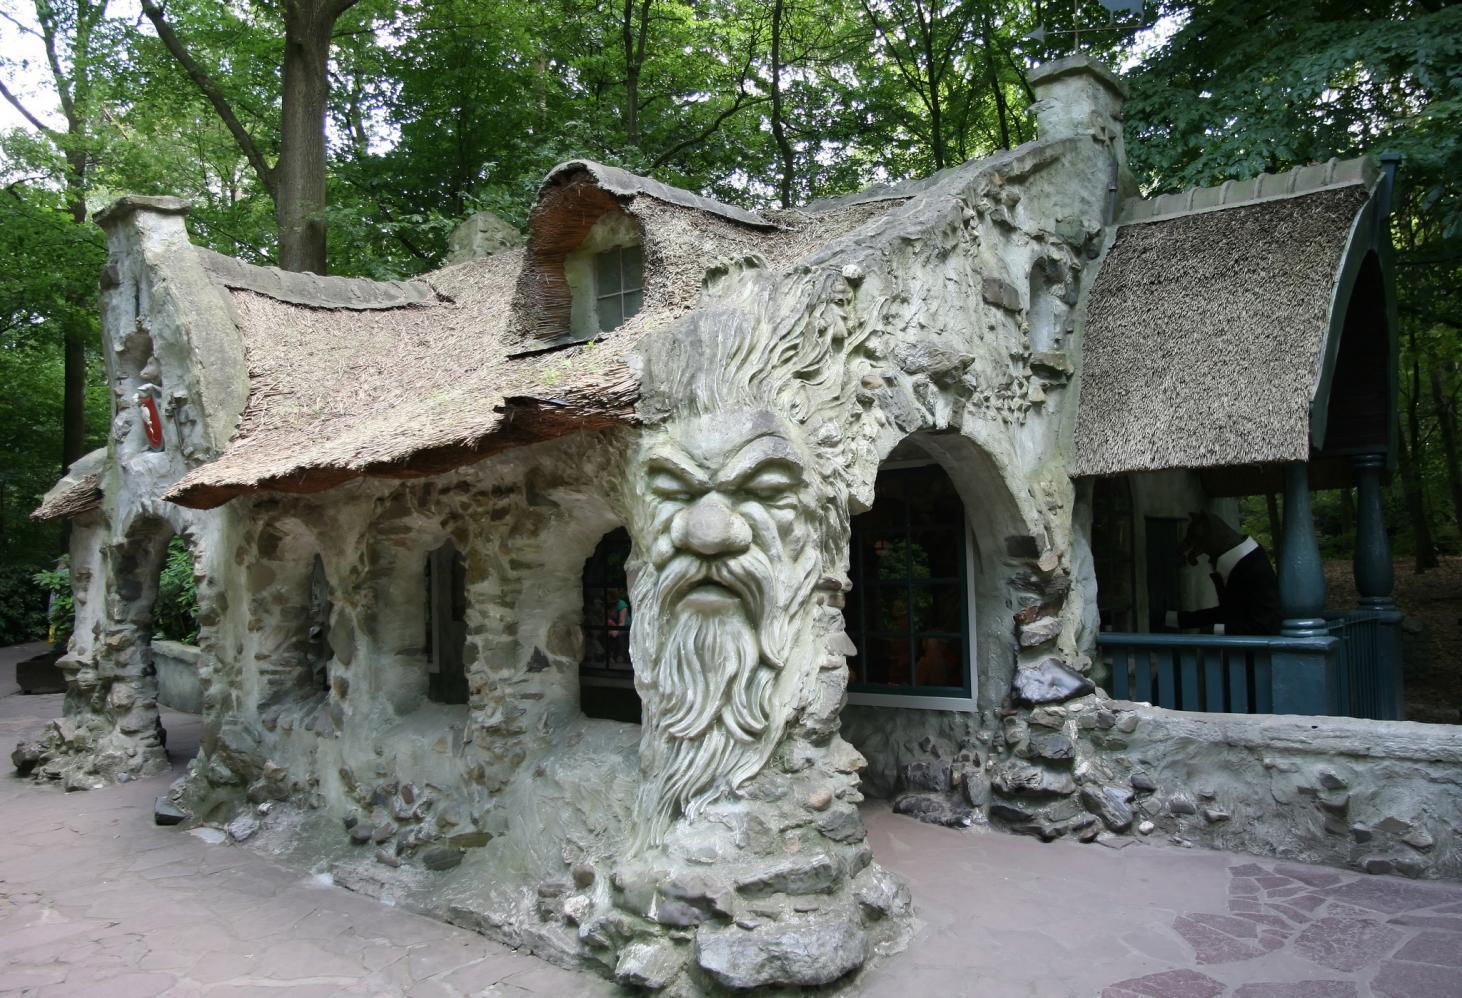 Парк развлечений Эфтелинг, Катсхёвел, Нидерланды